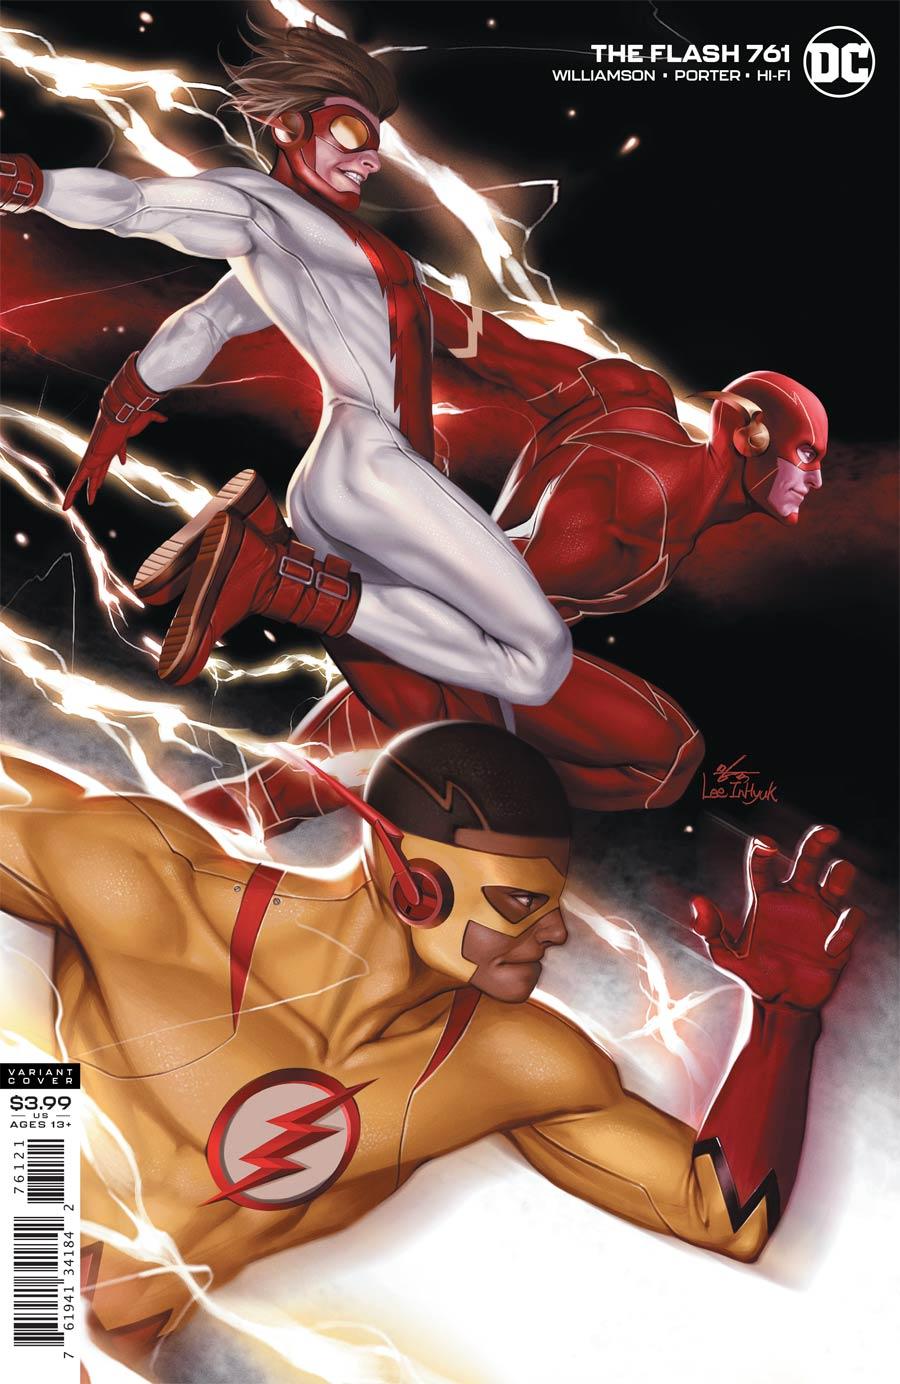 Flash Vol 5 #761 Cover B Variant Inhyuk Lee Cover